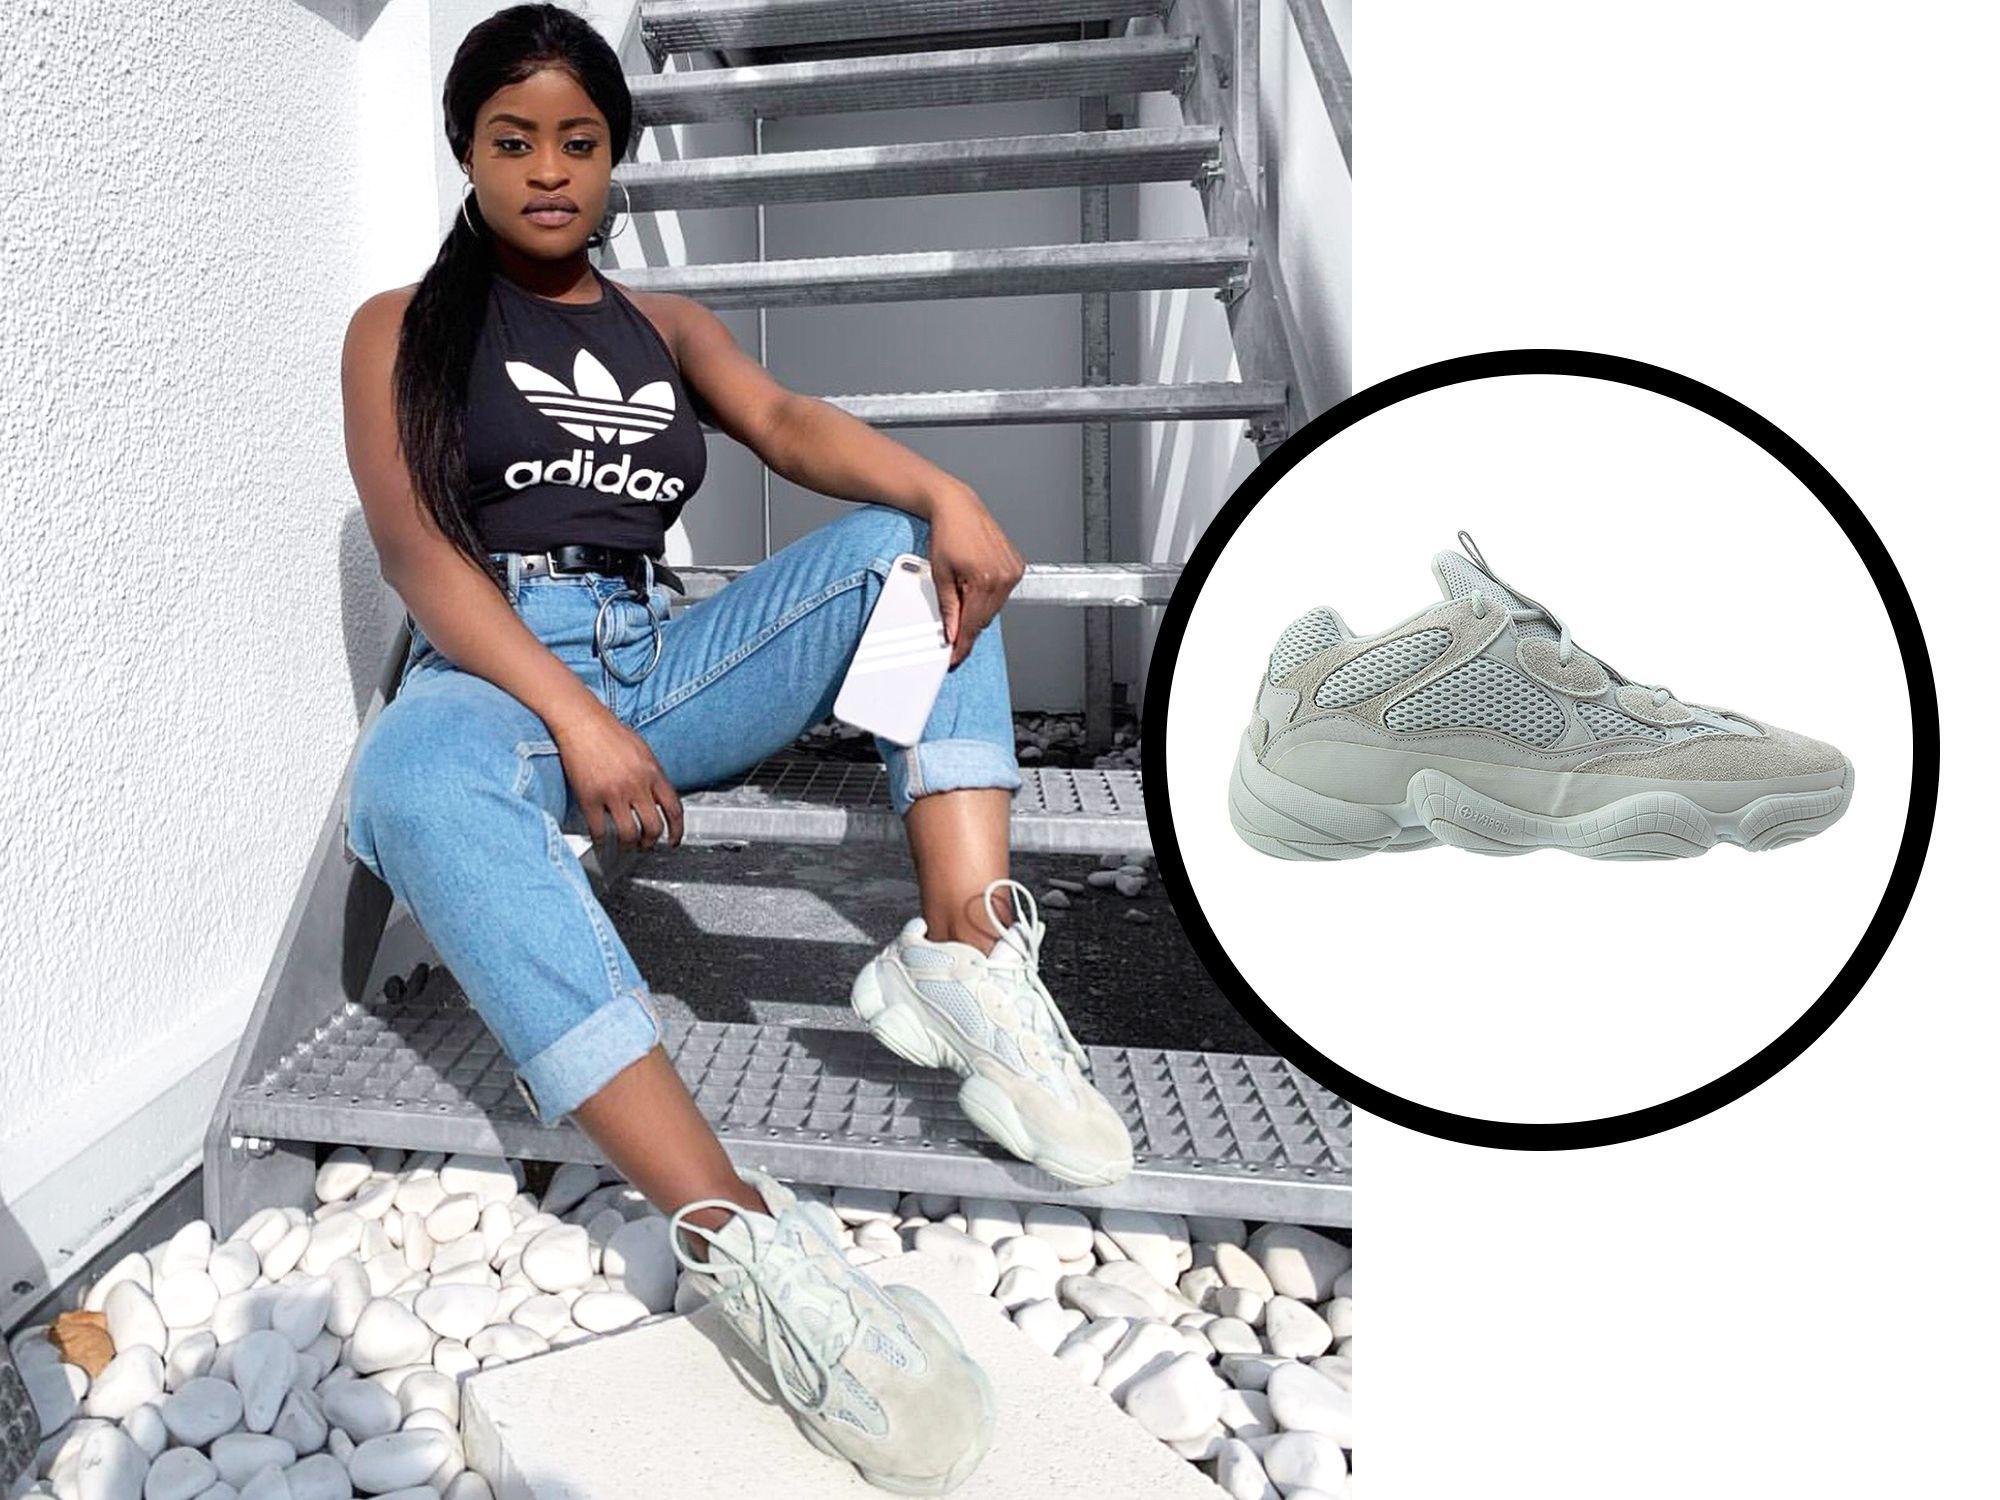 Adidas x Yeezy 500 Salt Sneakers